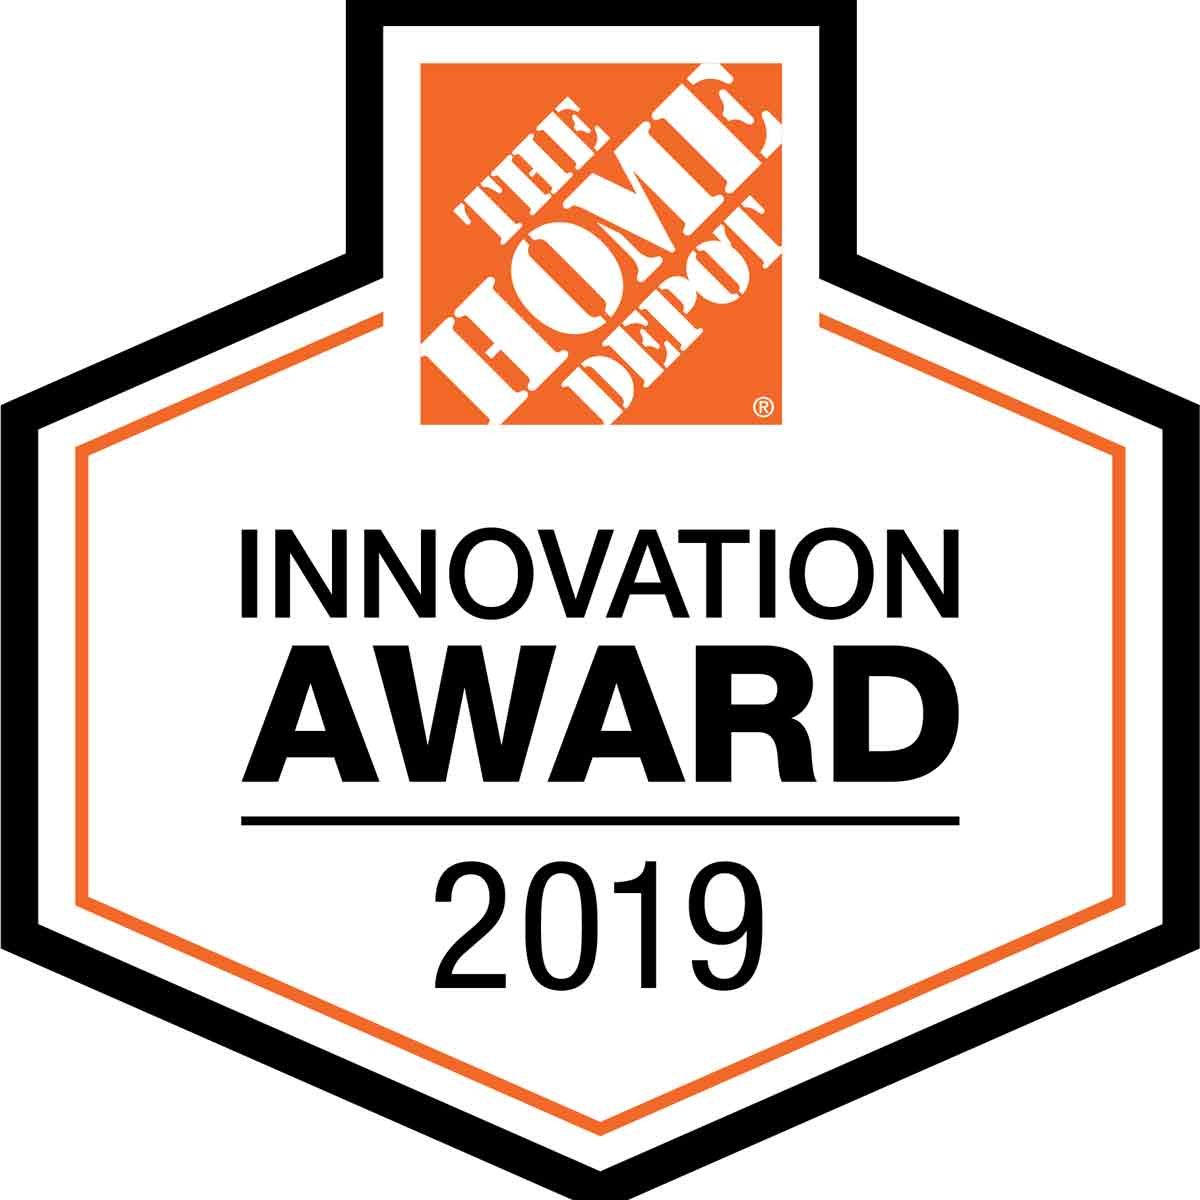 The Home Depot 2019 Innovation Award